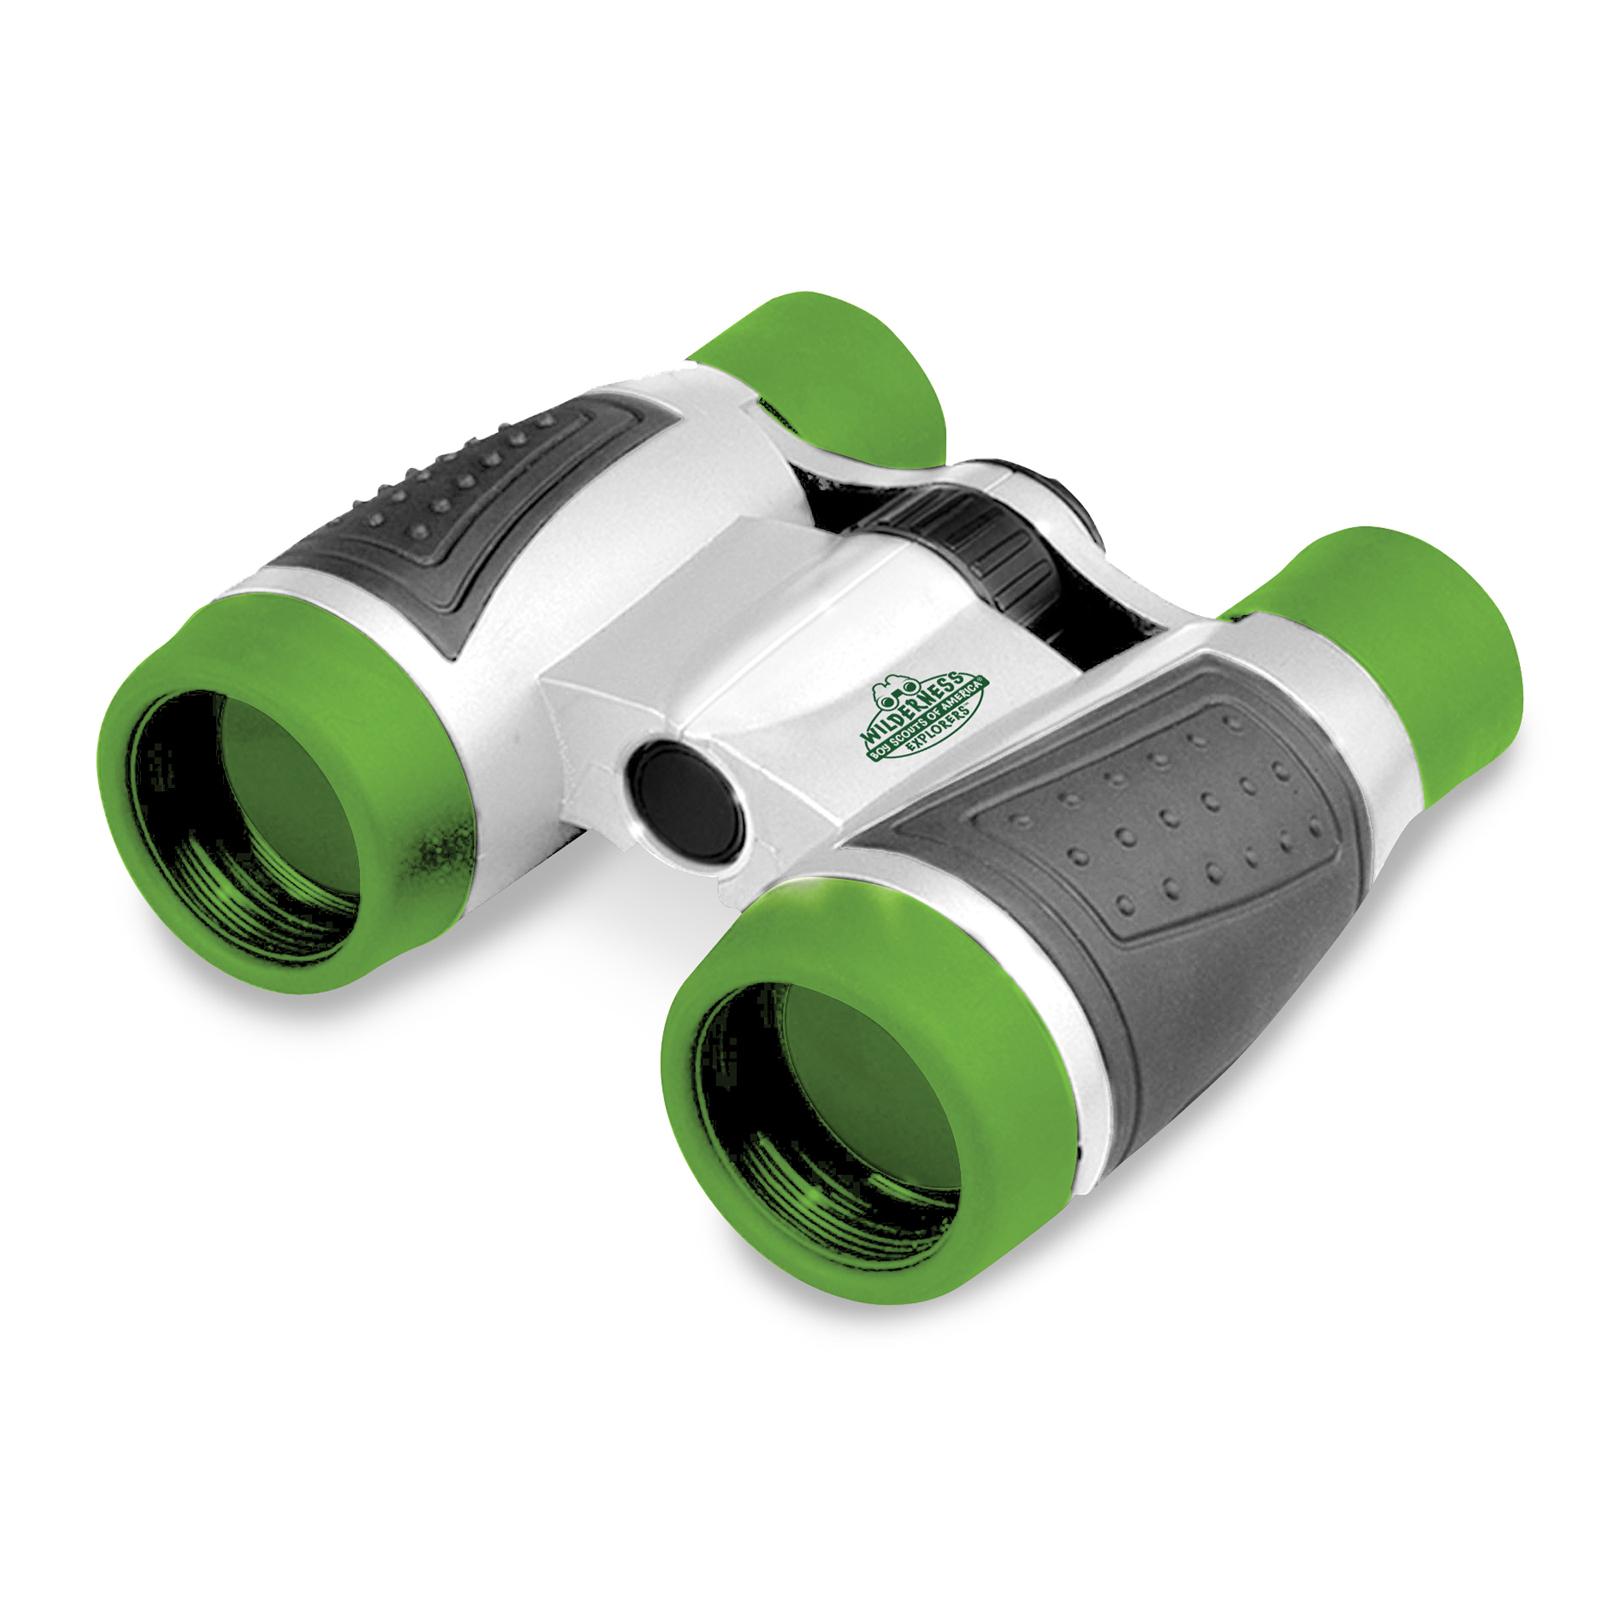 Wilderness Explorers Binoculars by Boy Scouts of America PartNumber: 05233148000P KsnValue: 9708563 MfgPartNumber: 194600